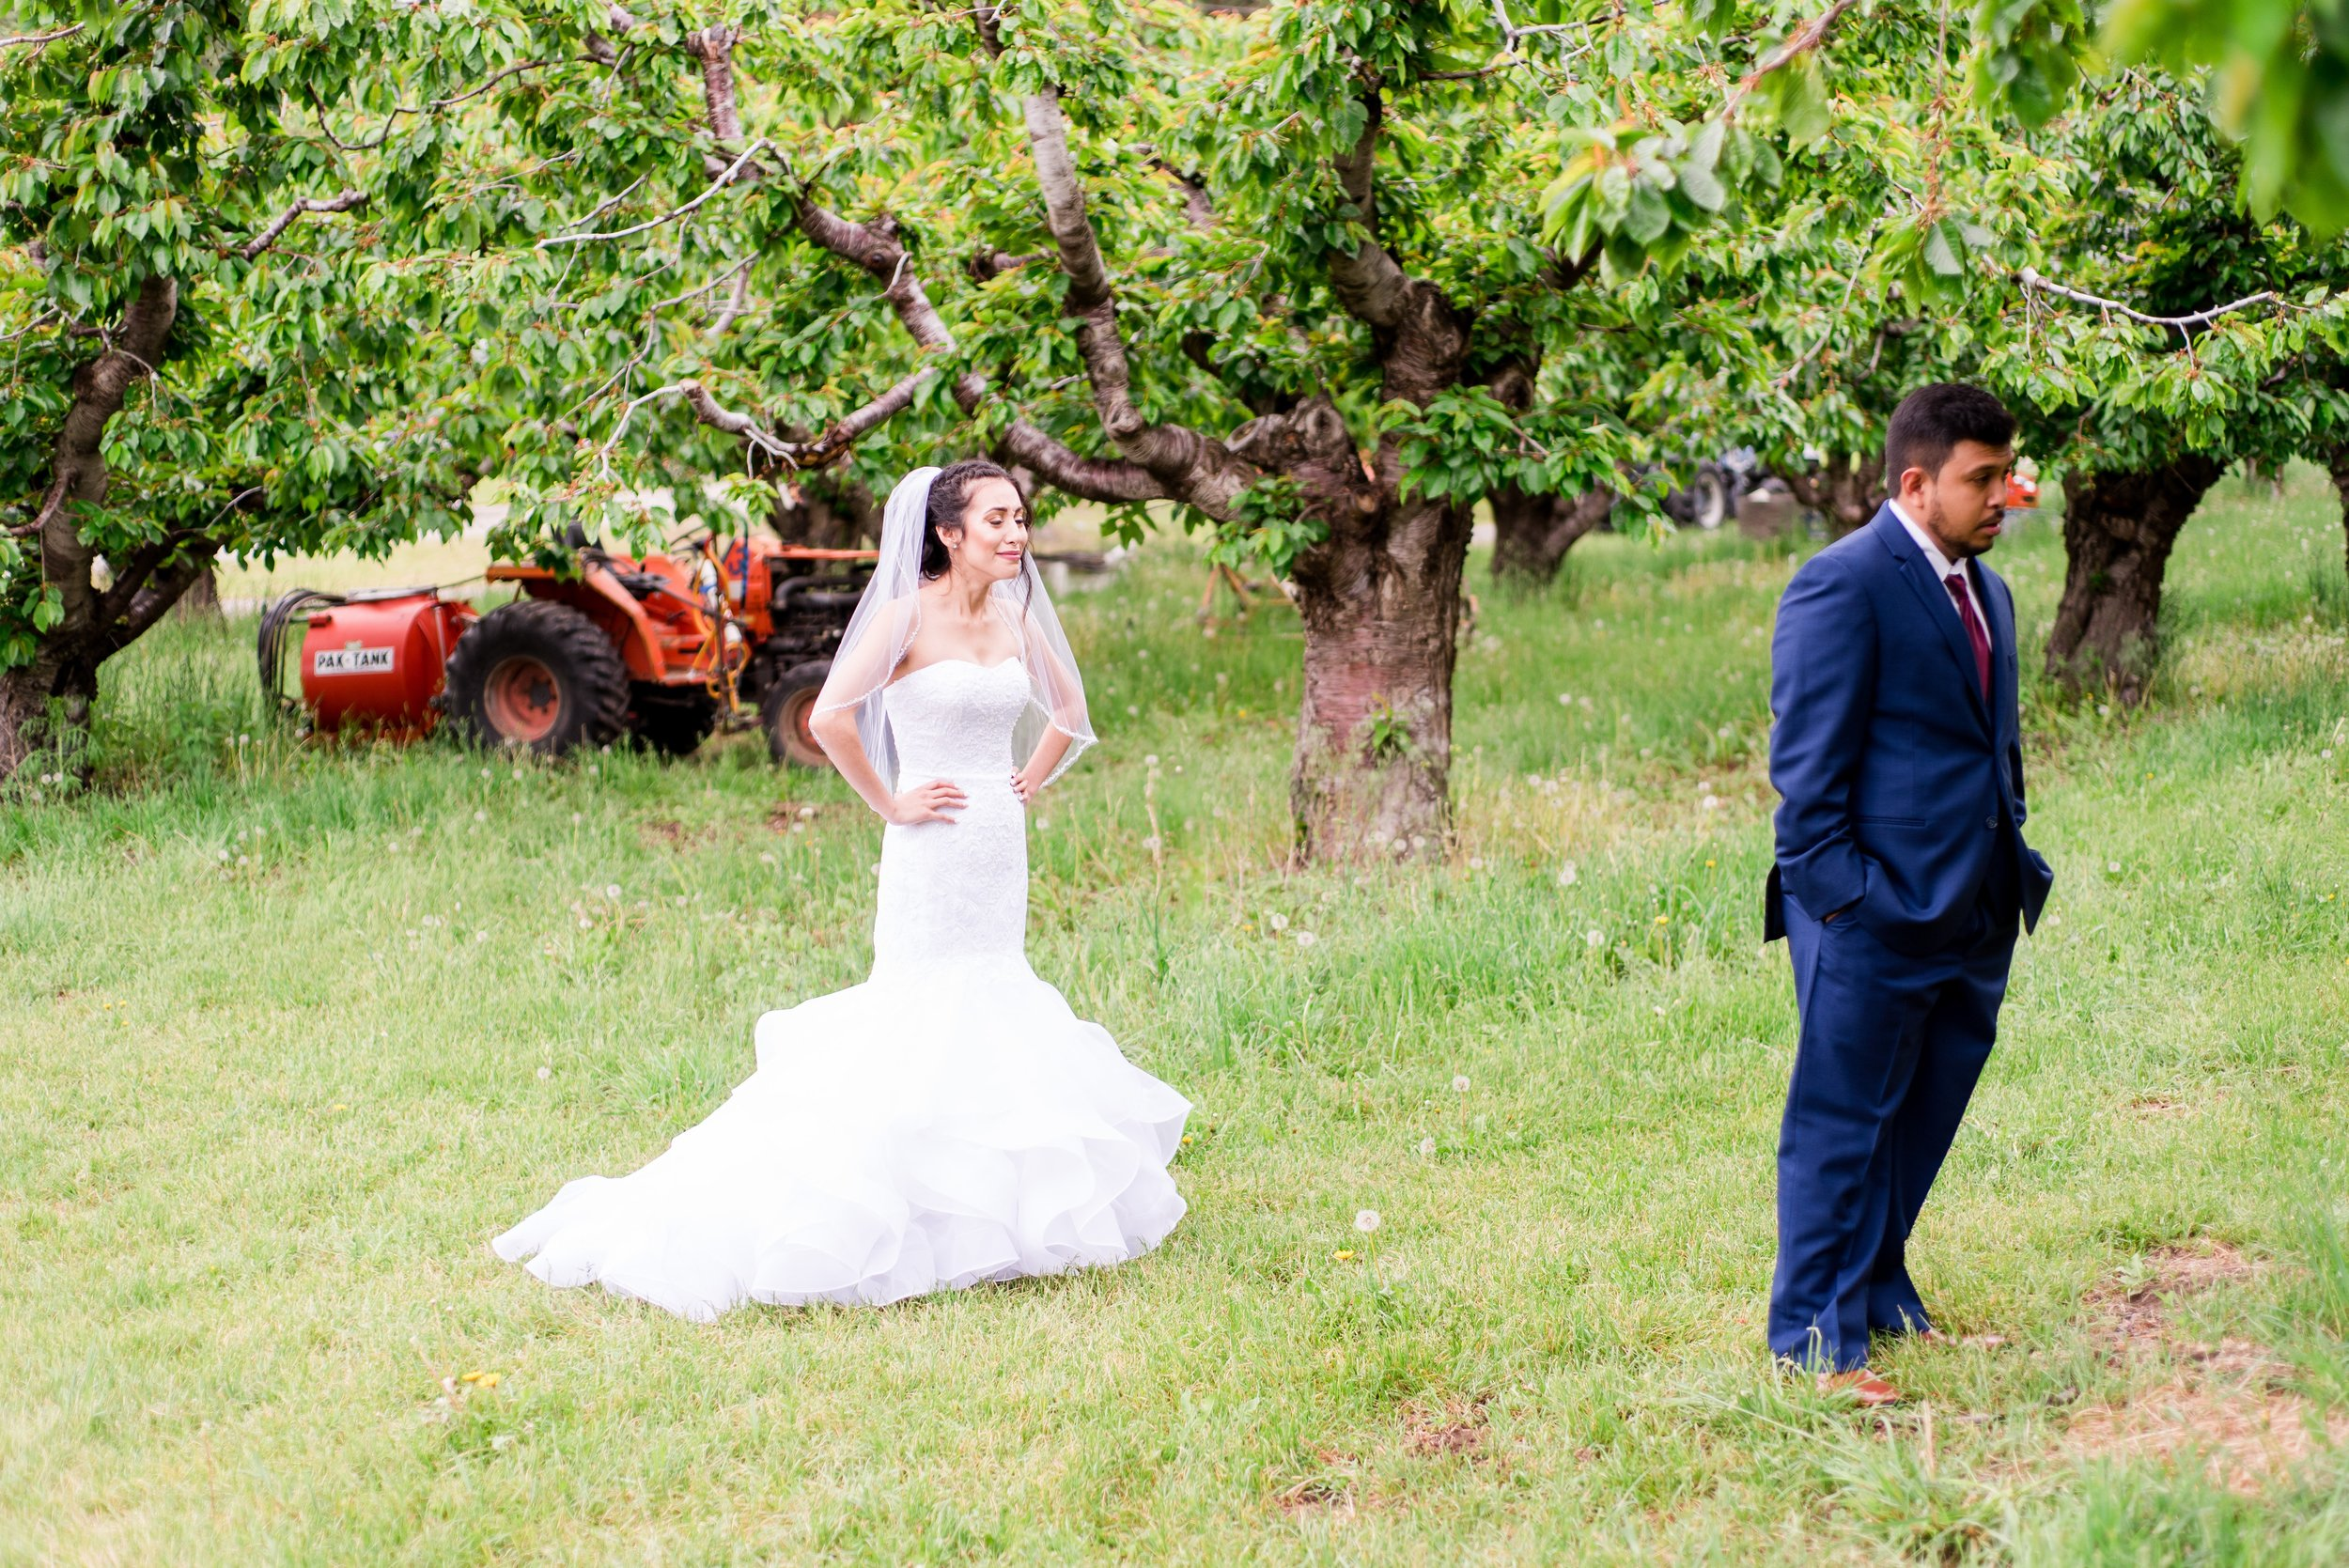 First Look - Wenatchee, Washington Hampton Hideaway White Barn Wedding - Wenatchee, Washington Wedding Photographer - Morgan Tayler Photo & Design - Tri Cities, Washington Wedding Photographer